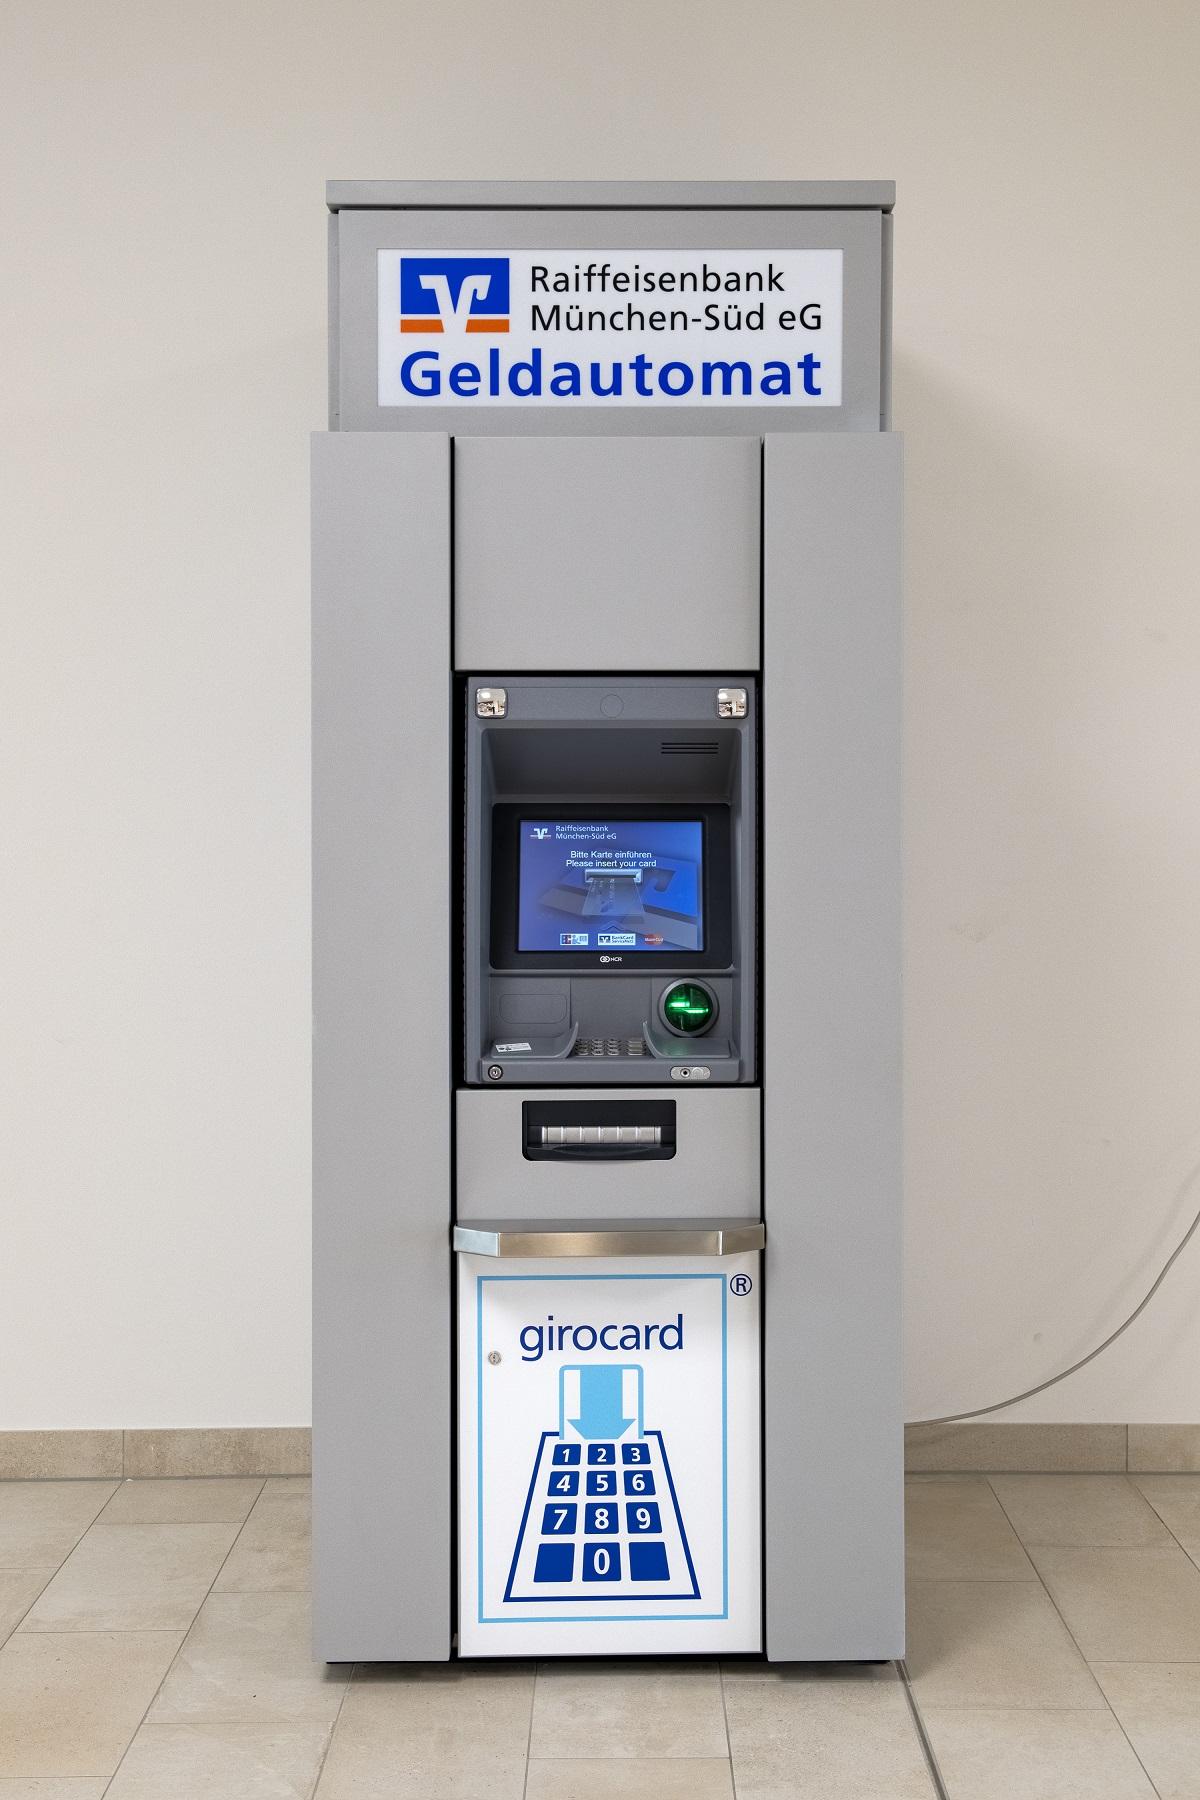 Foto de Geldautomat Raiffeisenbank München Süd eG- Fachmarktcenter